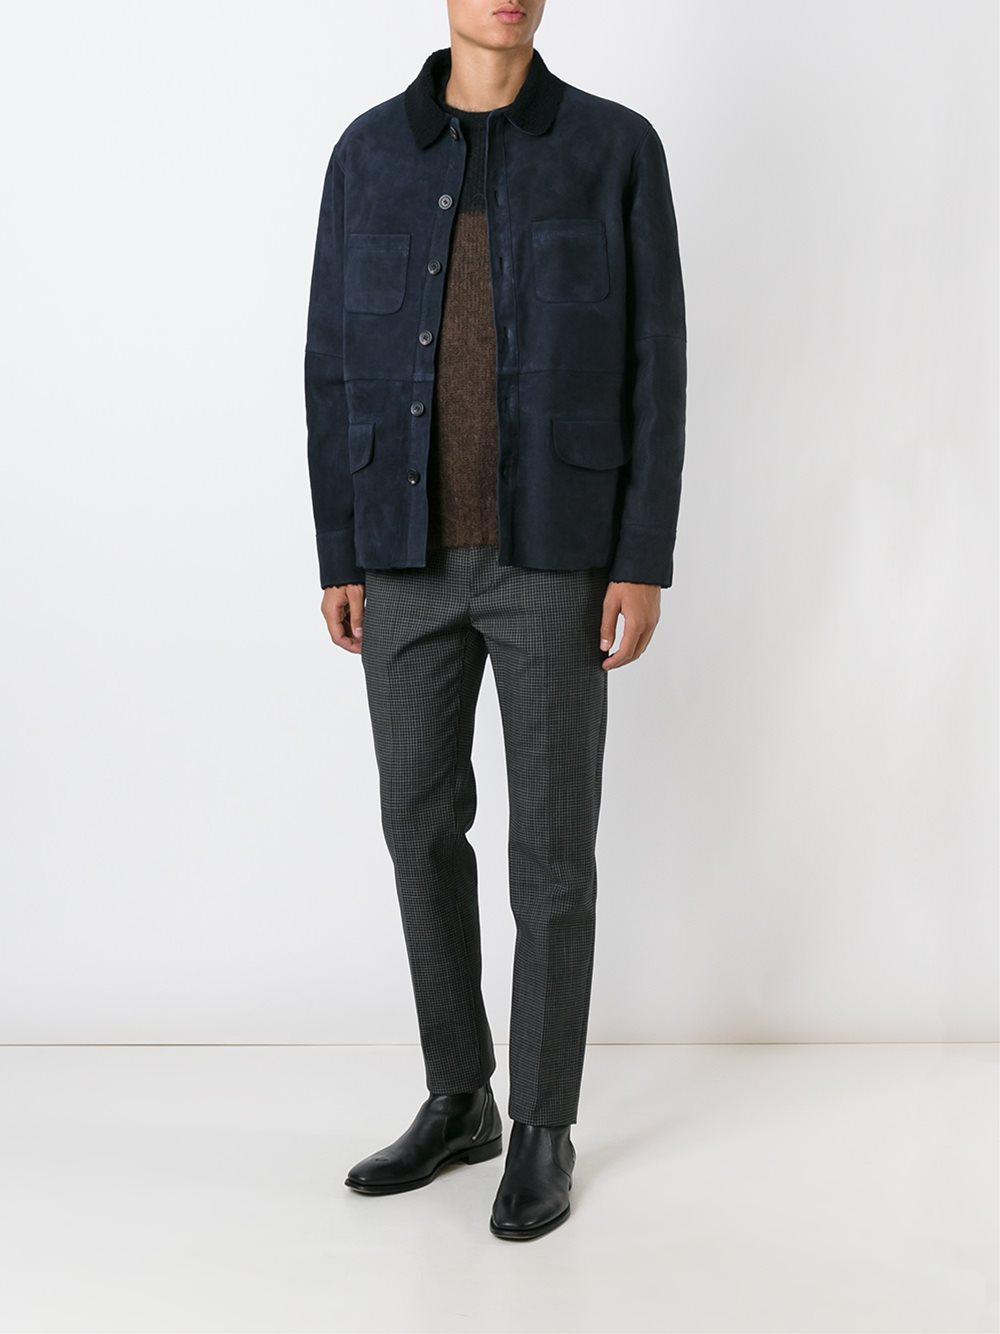 DESA NINETEENSEVENTYTWO Buttoned Leather Jacket in Blue for Men